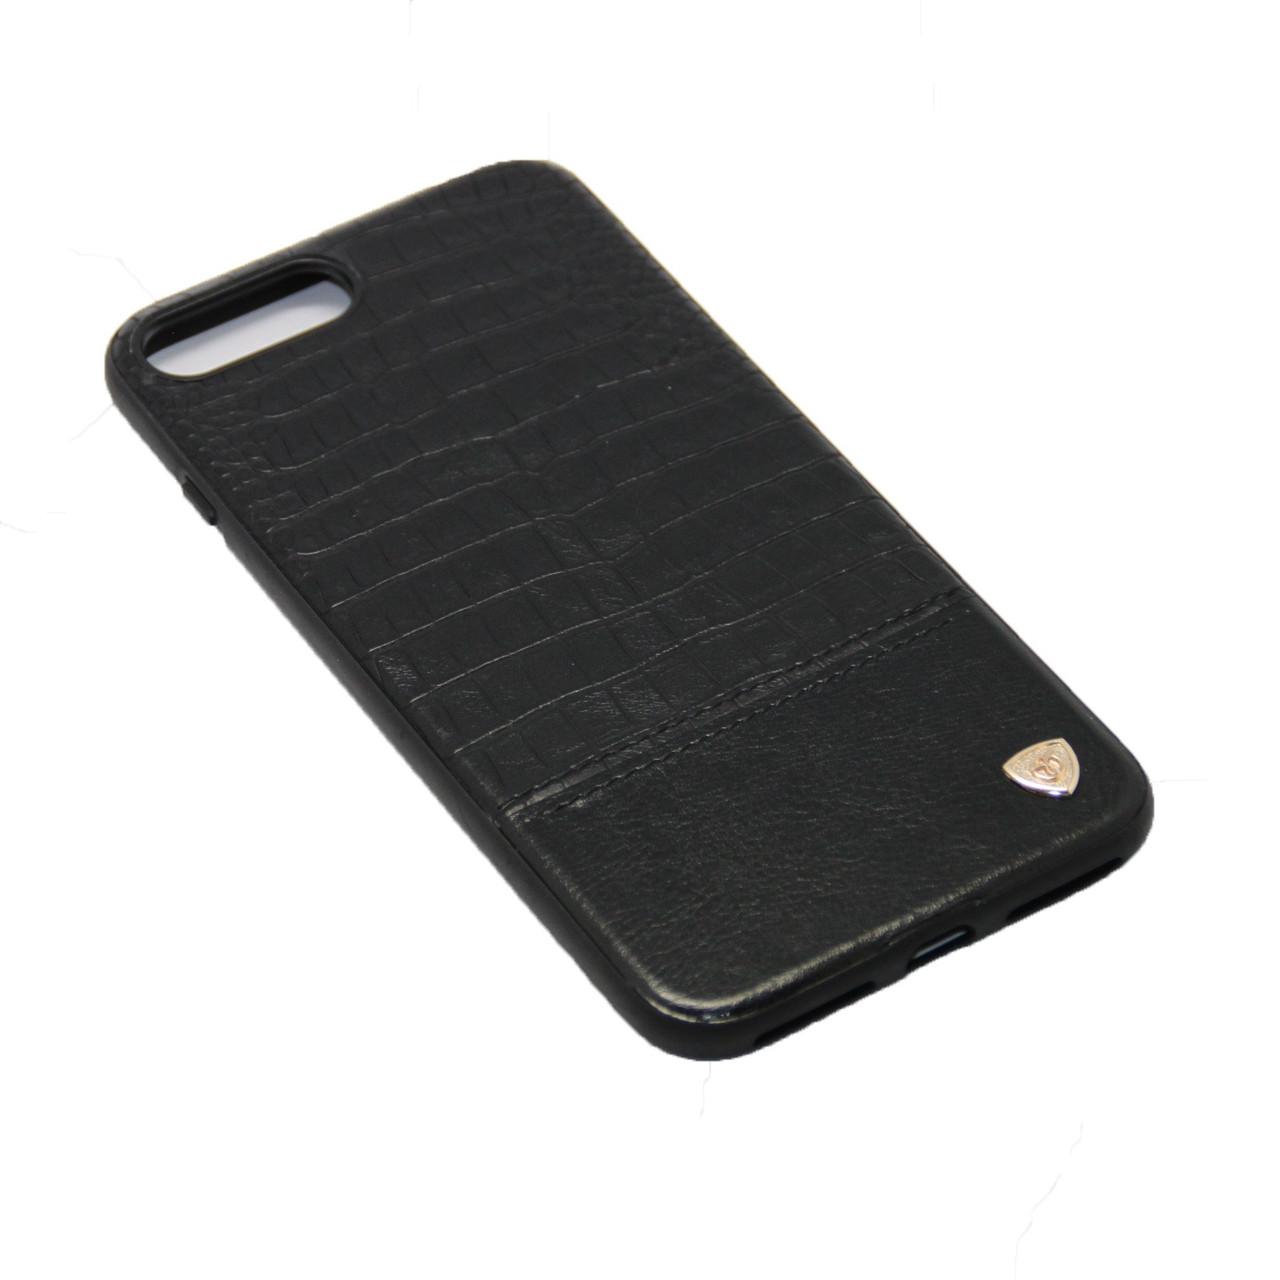 Чехол Yesido Croco Силиконовый iPhone 7 Plus